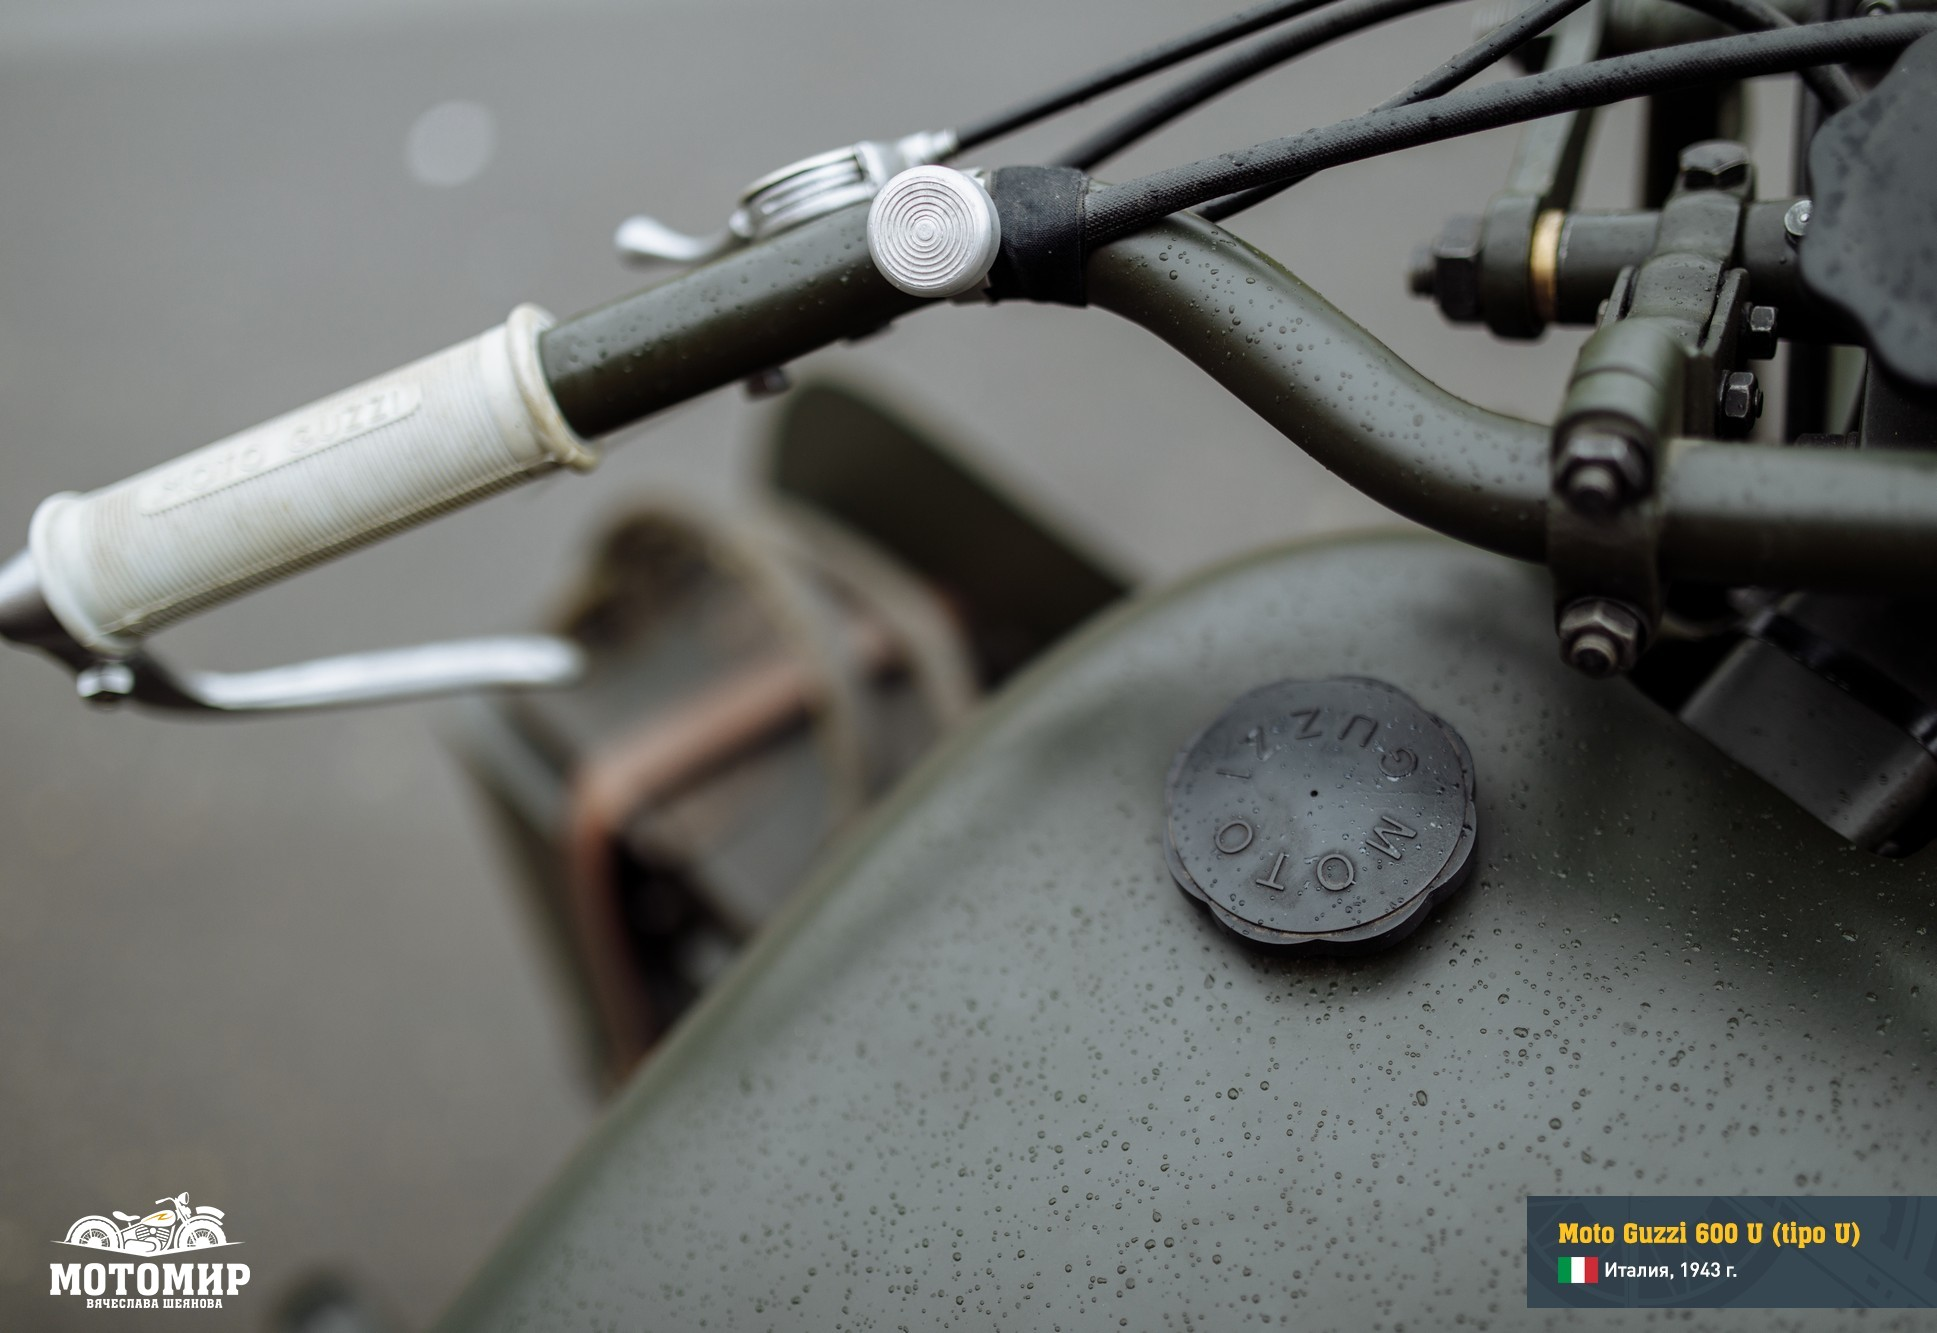 moto-guzzi-600-u-web-46